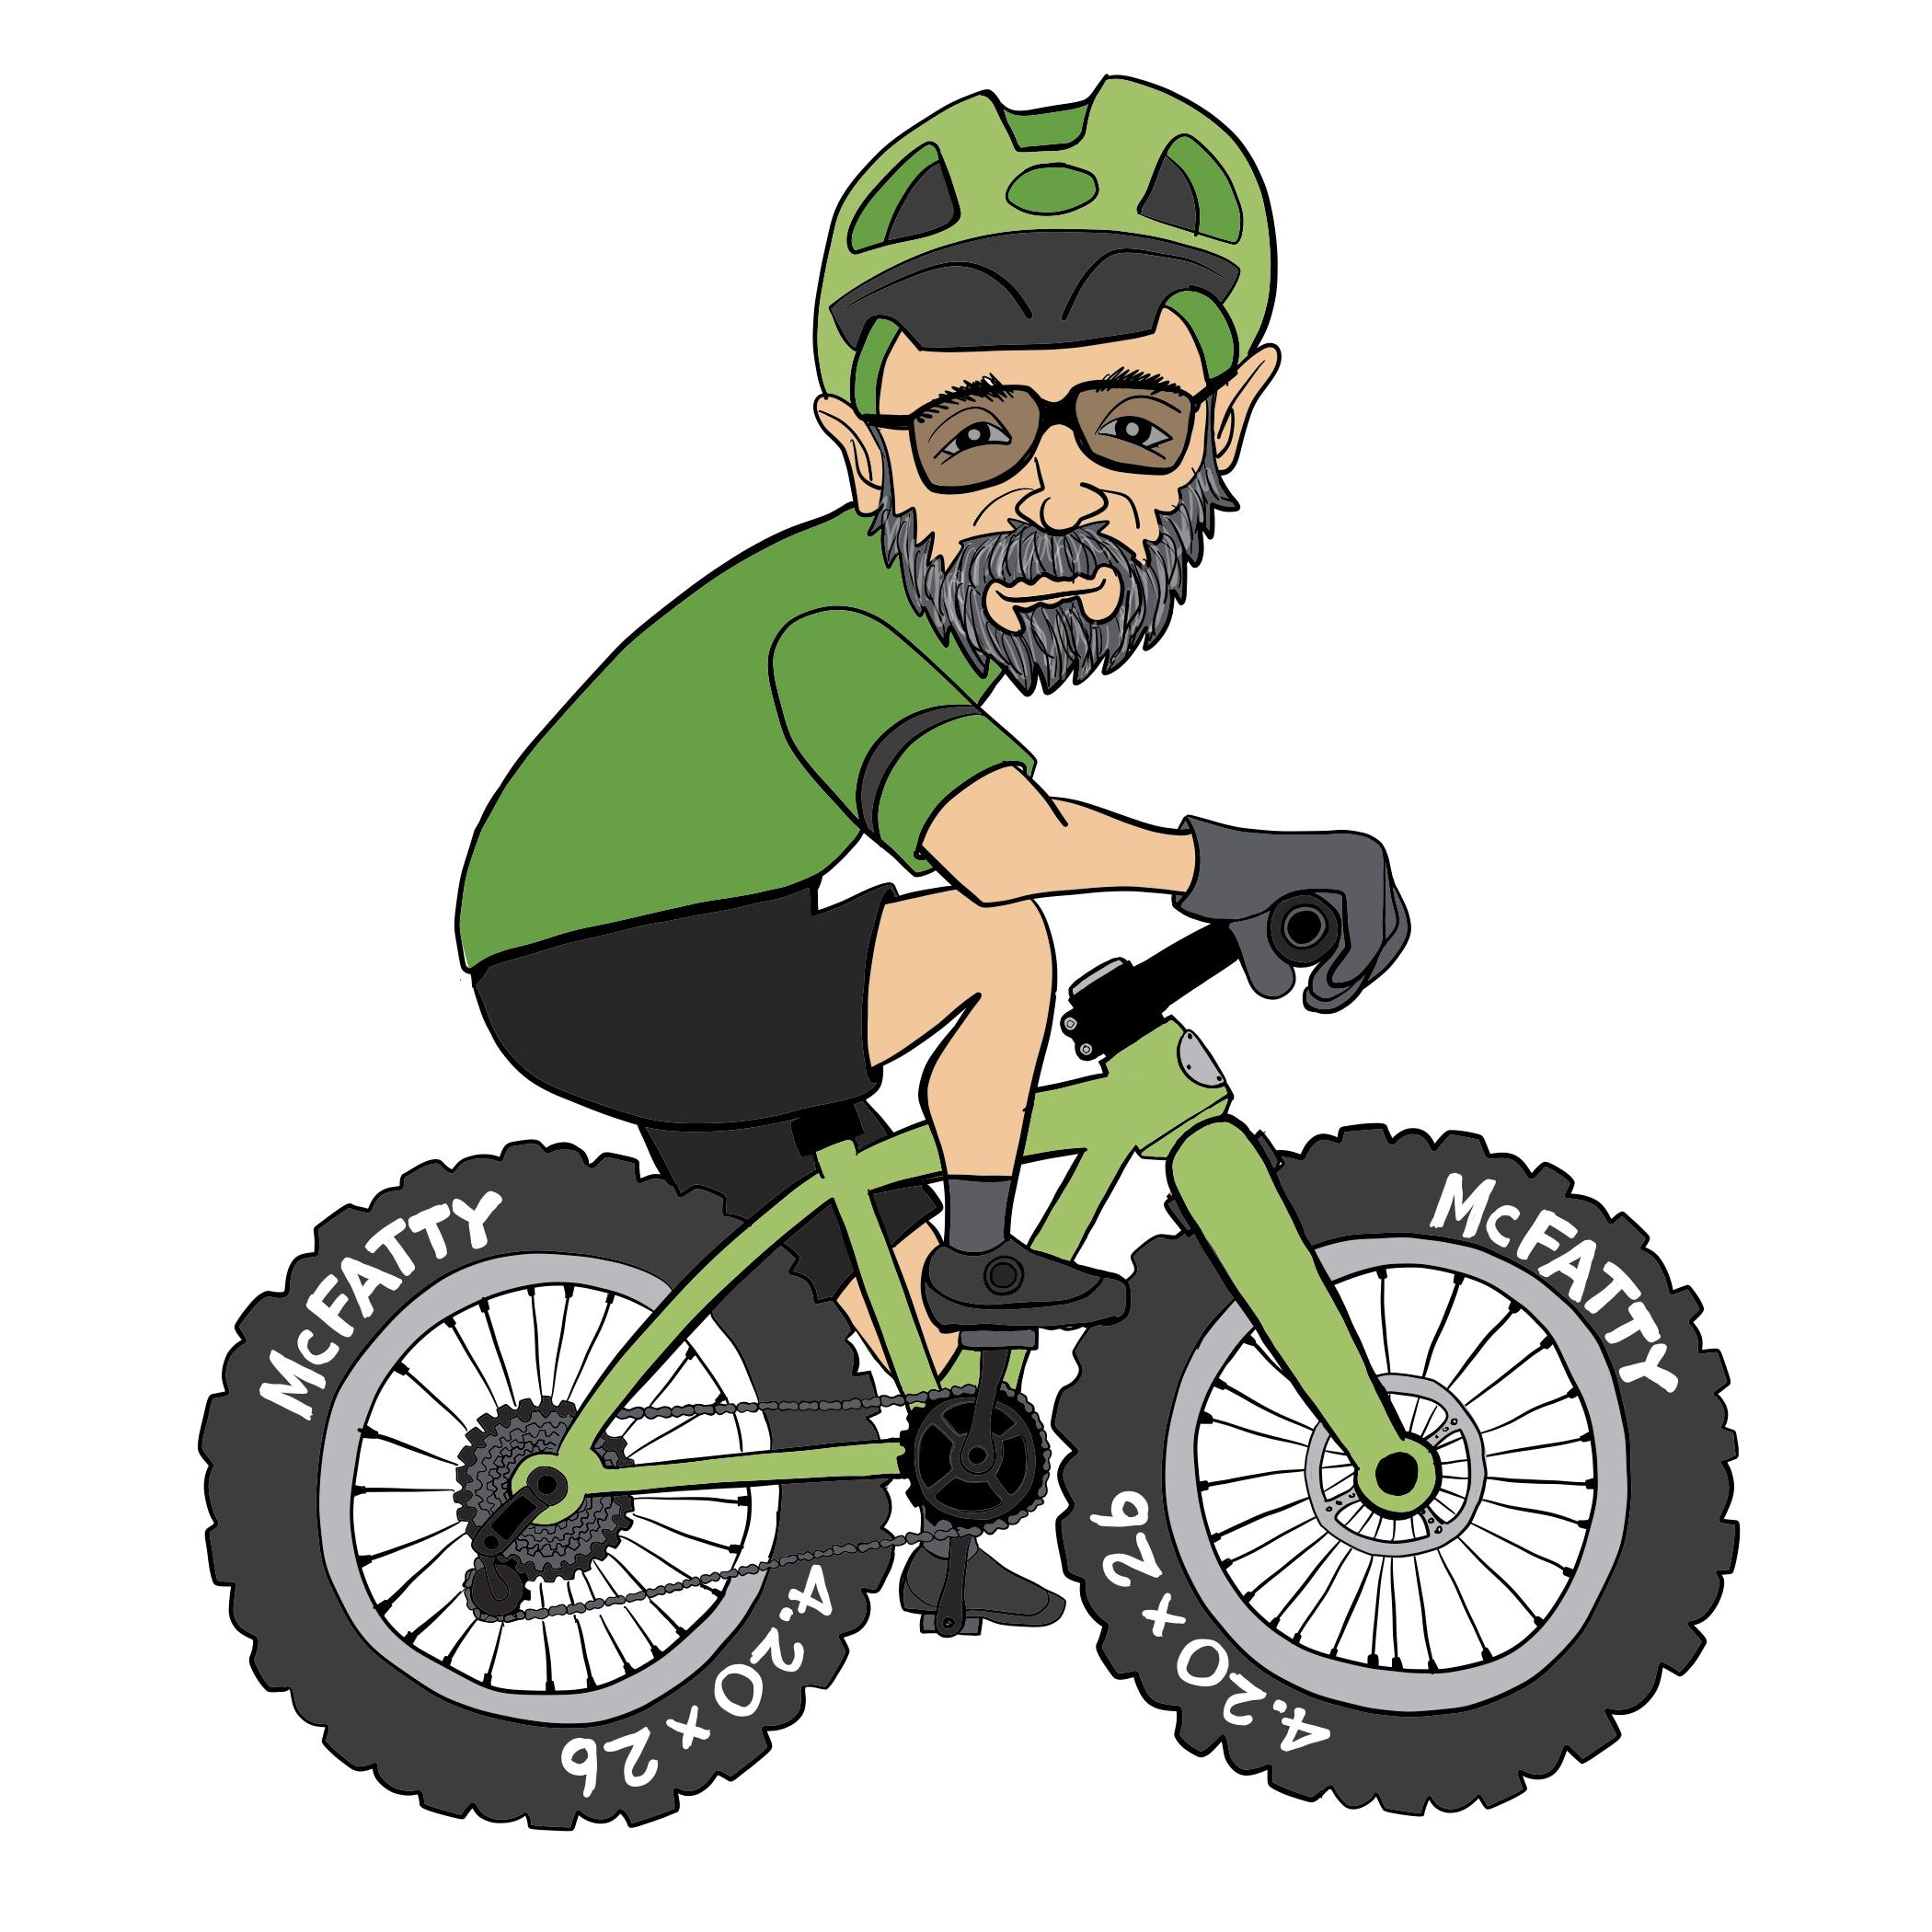 Freehand Mountain Biker Cartoon